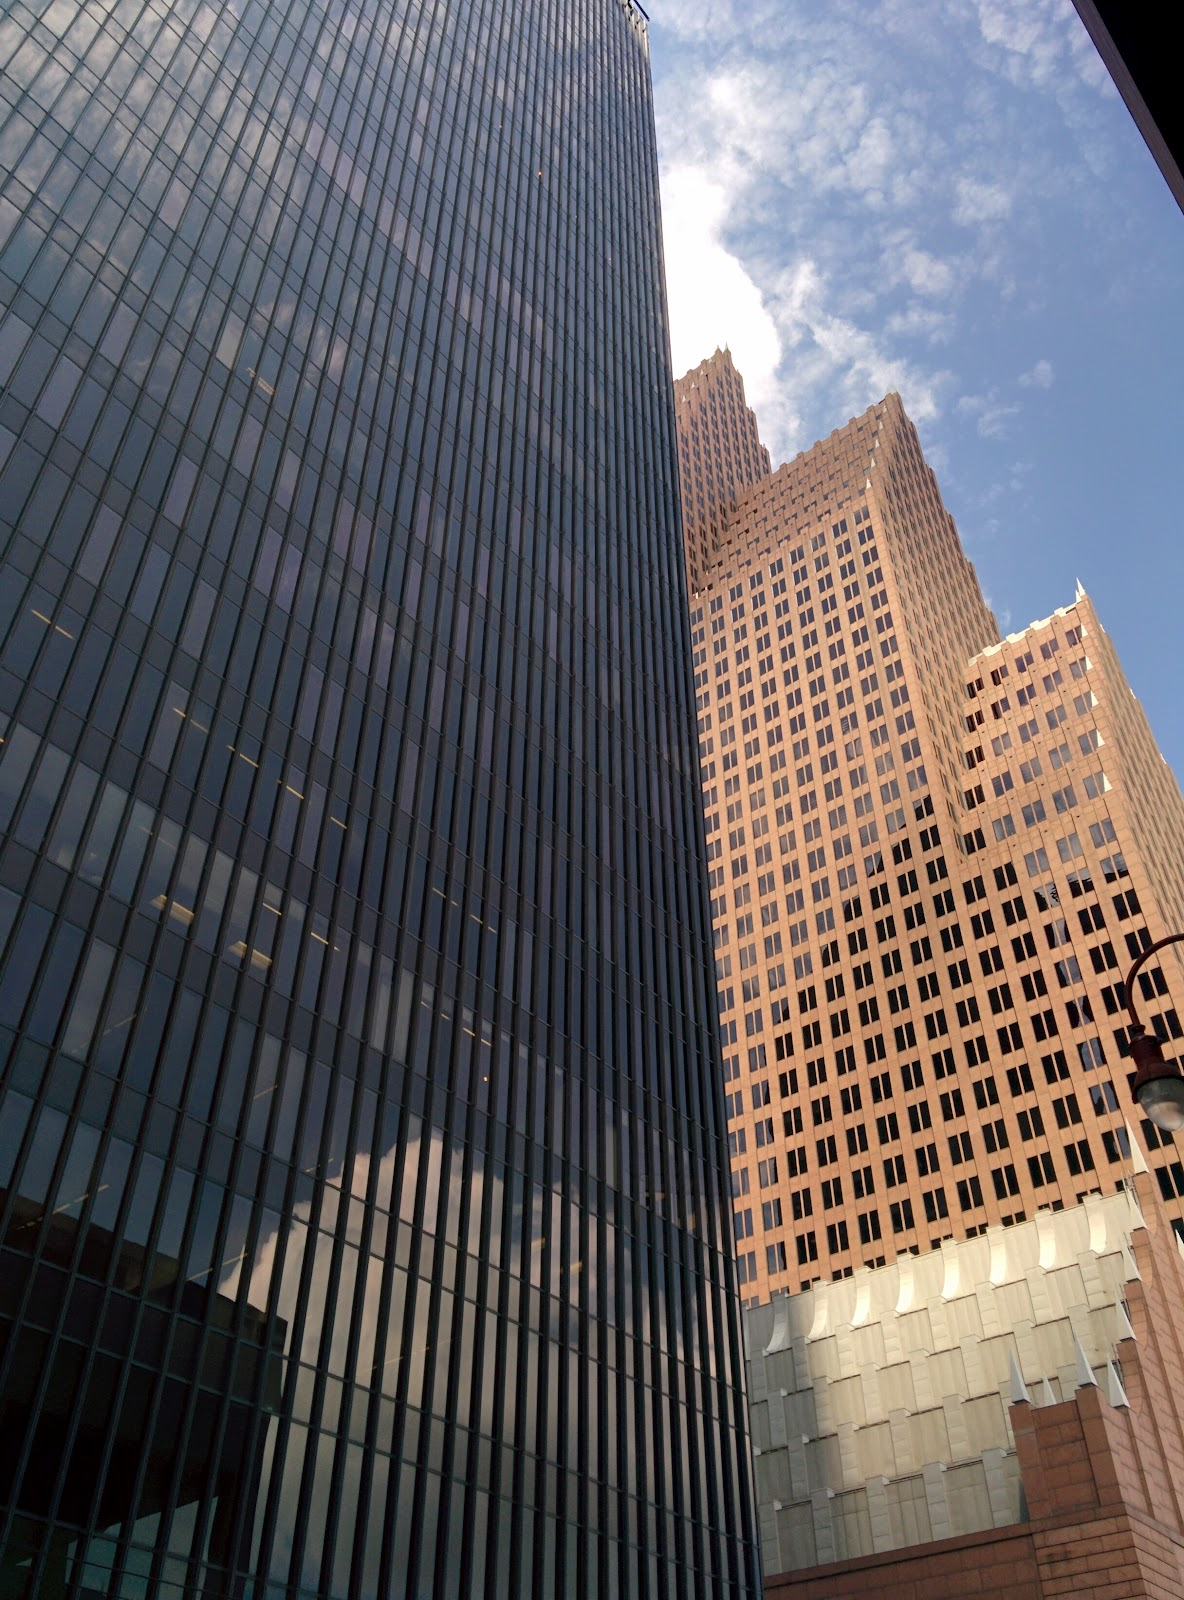 Two adjacent Philip Johnson skyscrapers